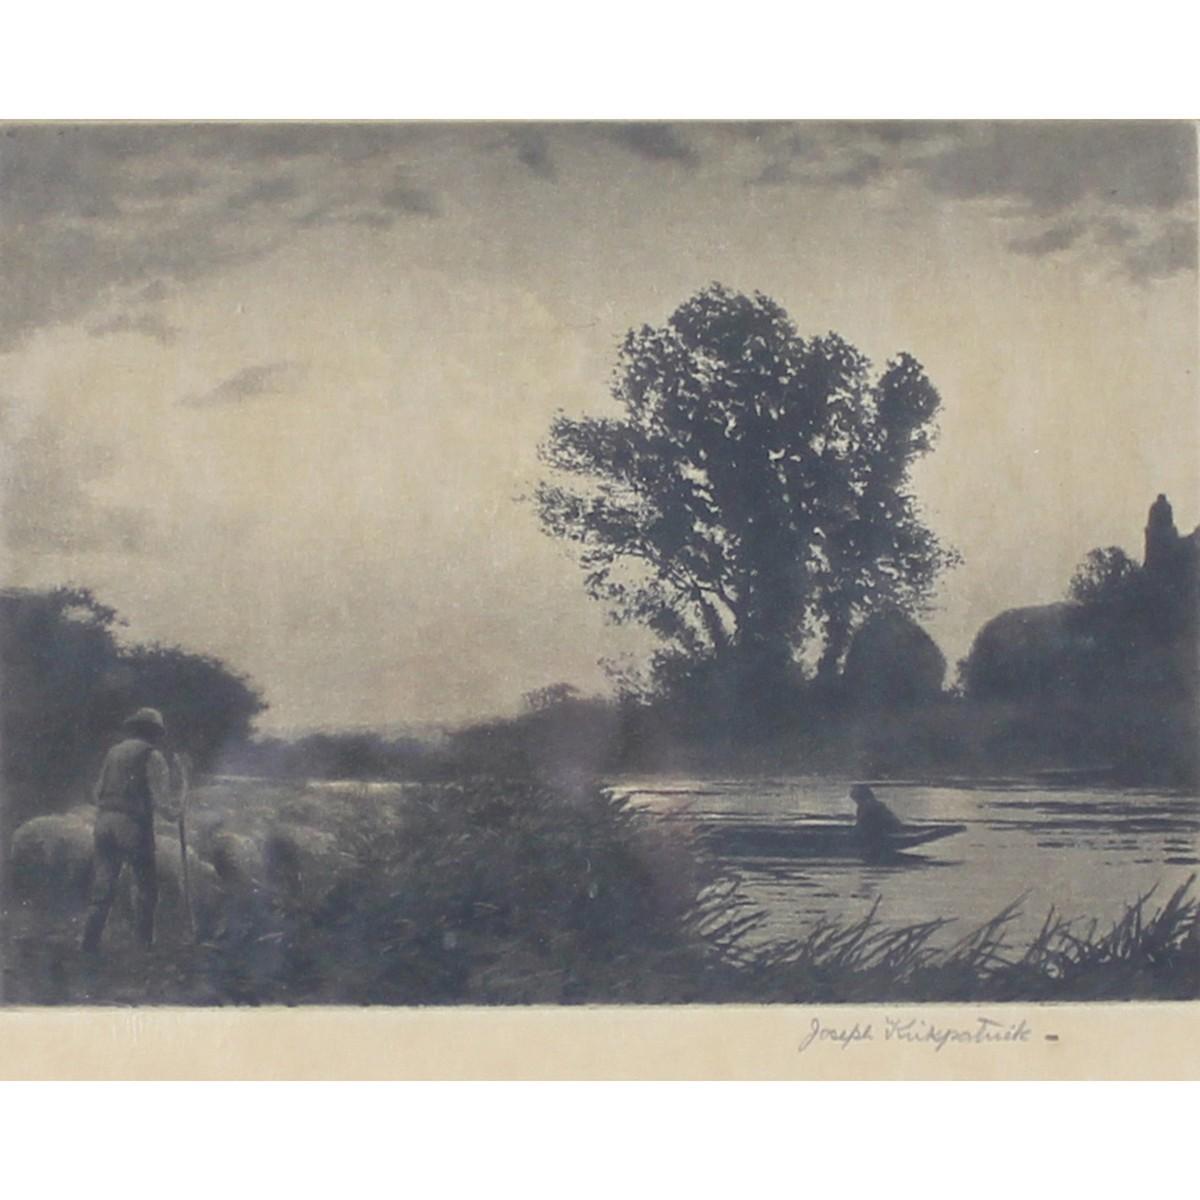 Lot 63 - Kirkpatrick, Joseph 1872-1936 British, (Two Items) Horses Ploughing by a Windmill